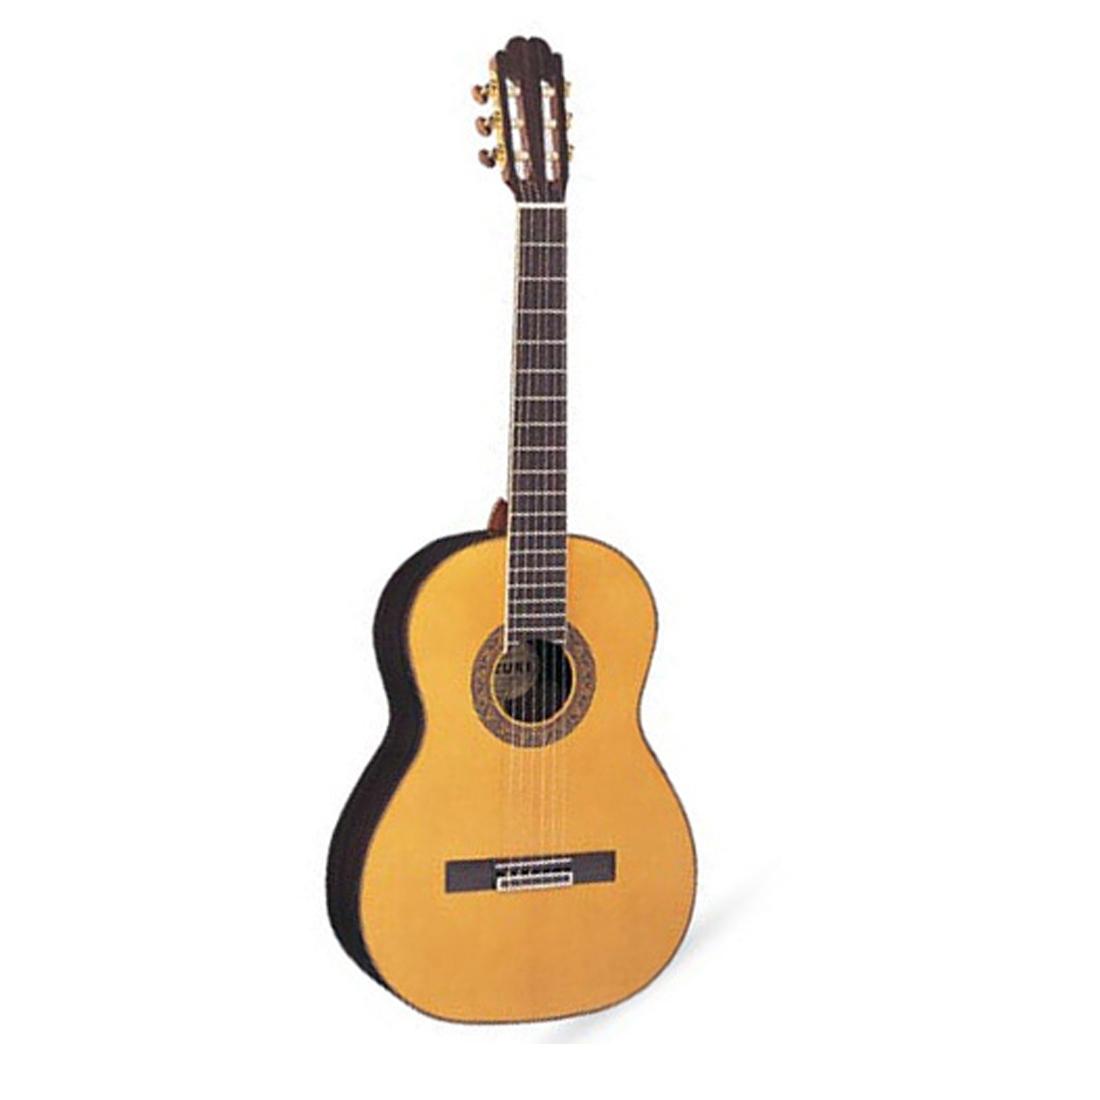 dan guitar suzuki sdg-6nl